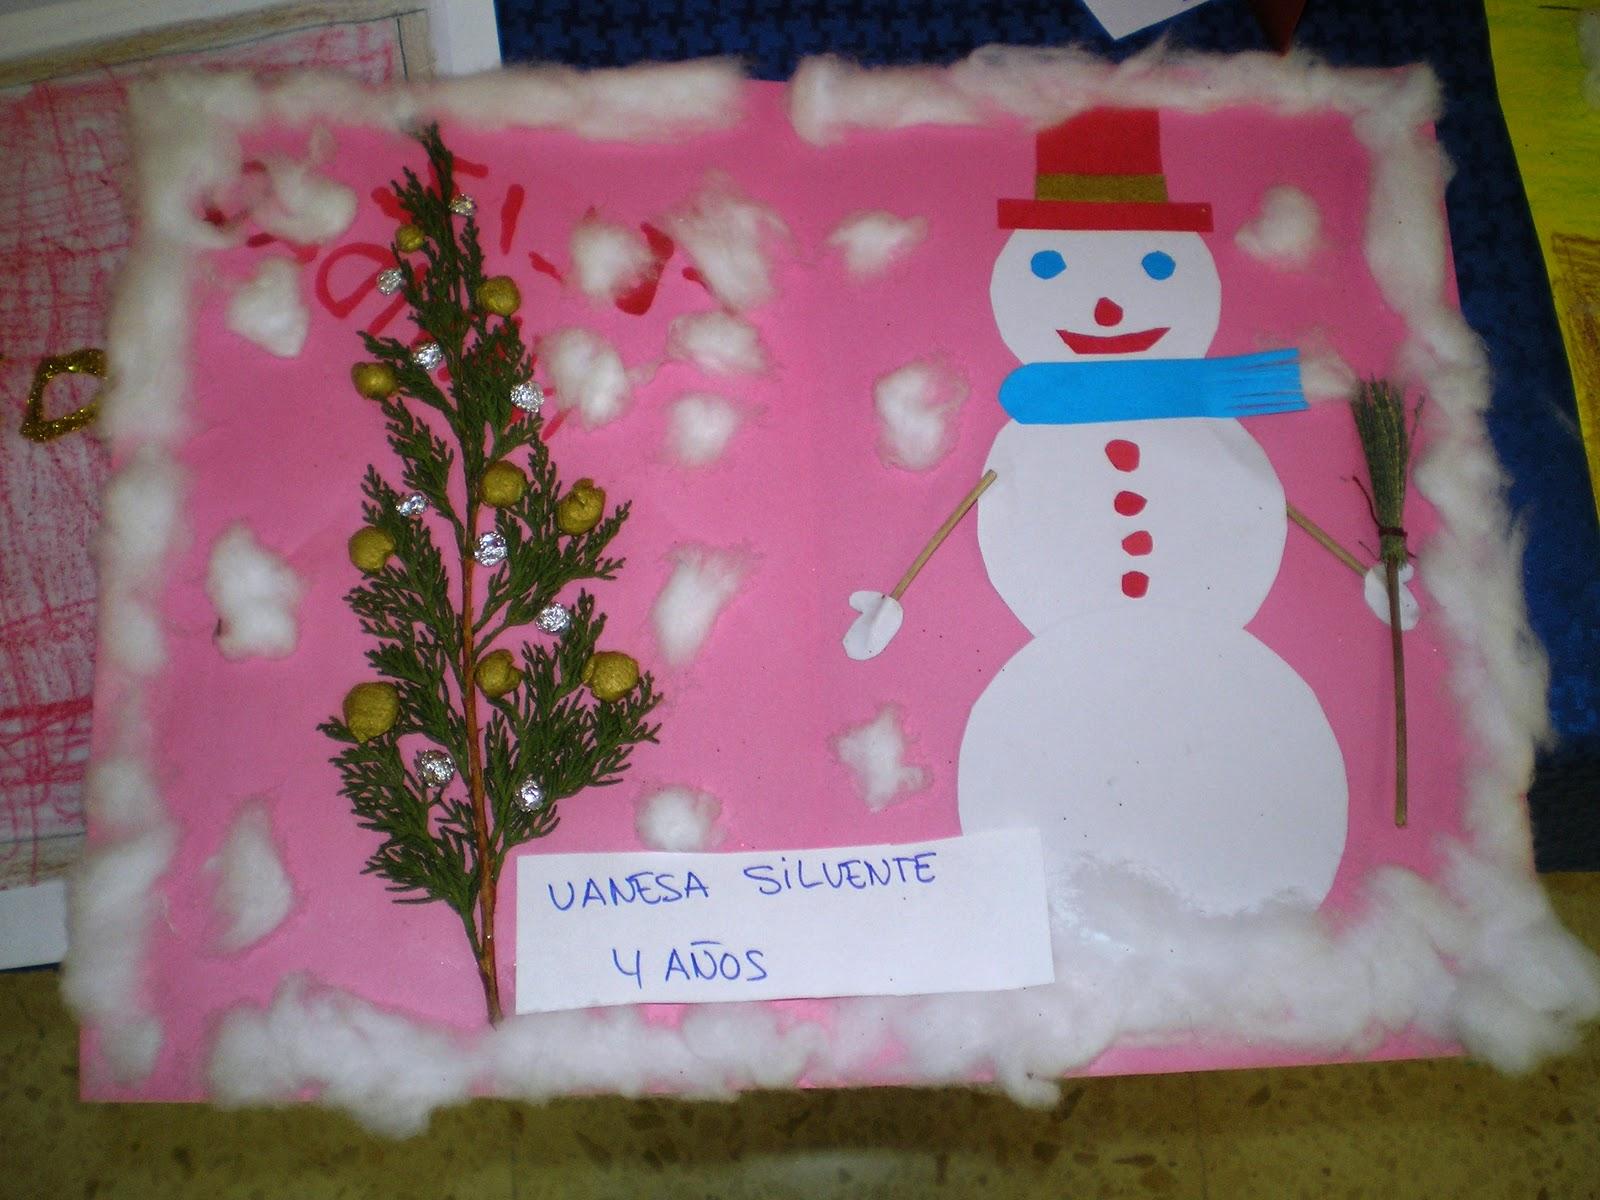 Maestra de infantil tarjetas de navidad hechas por ni os - Postales de navidad hechas por ninos ...